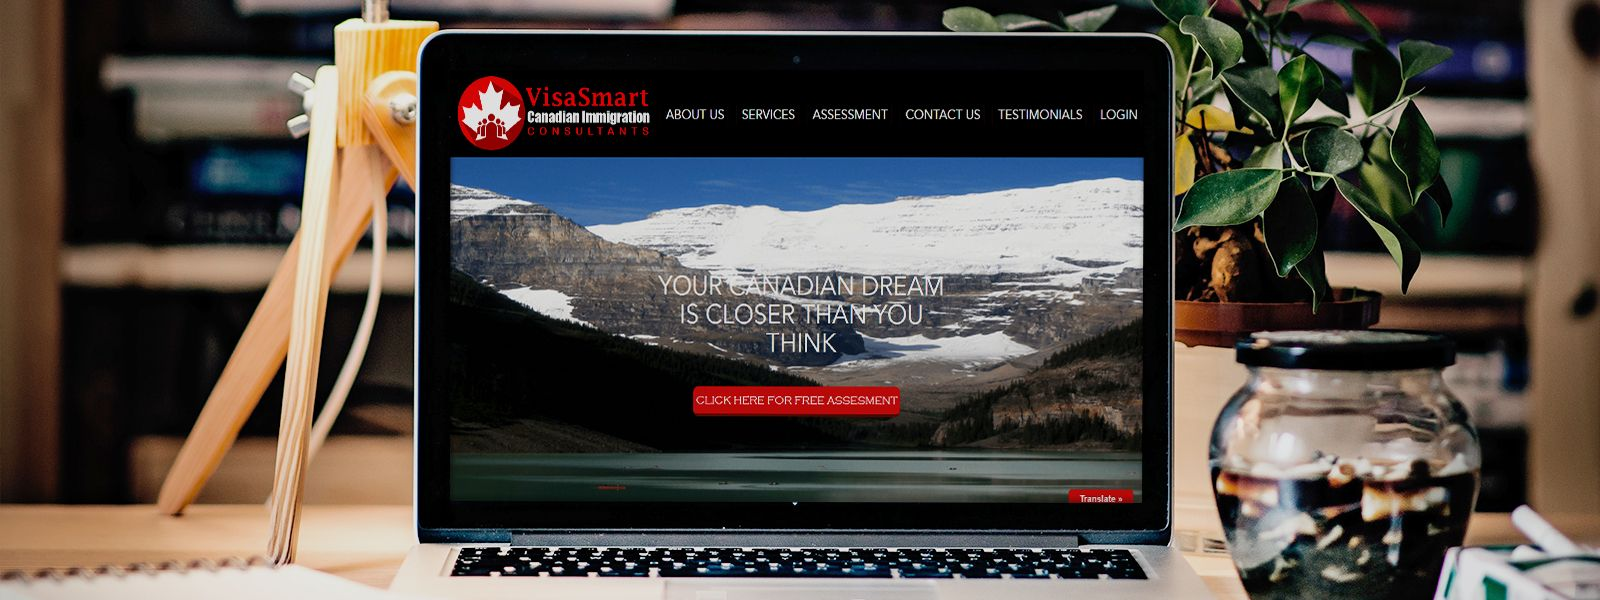 Web Design And Development In Philippines Web Development Design Web Design Website Services